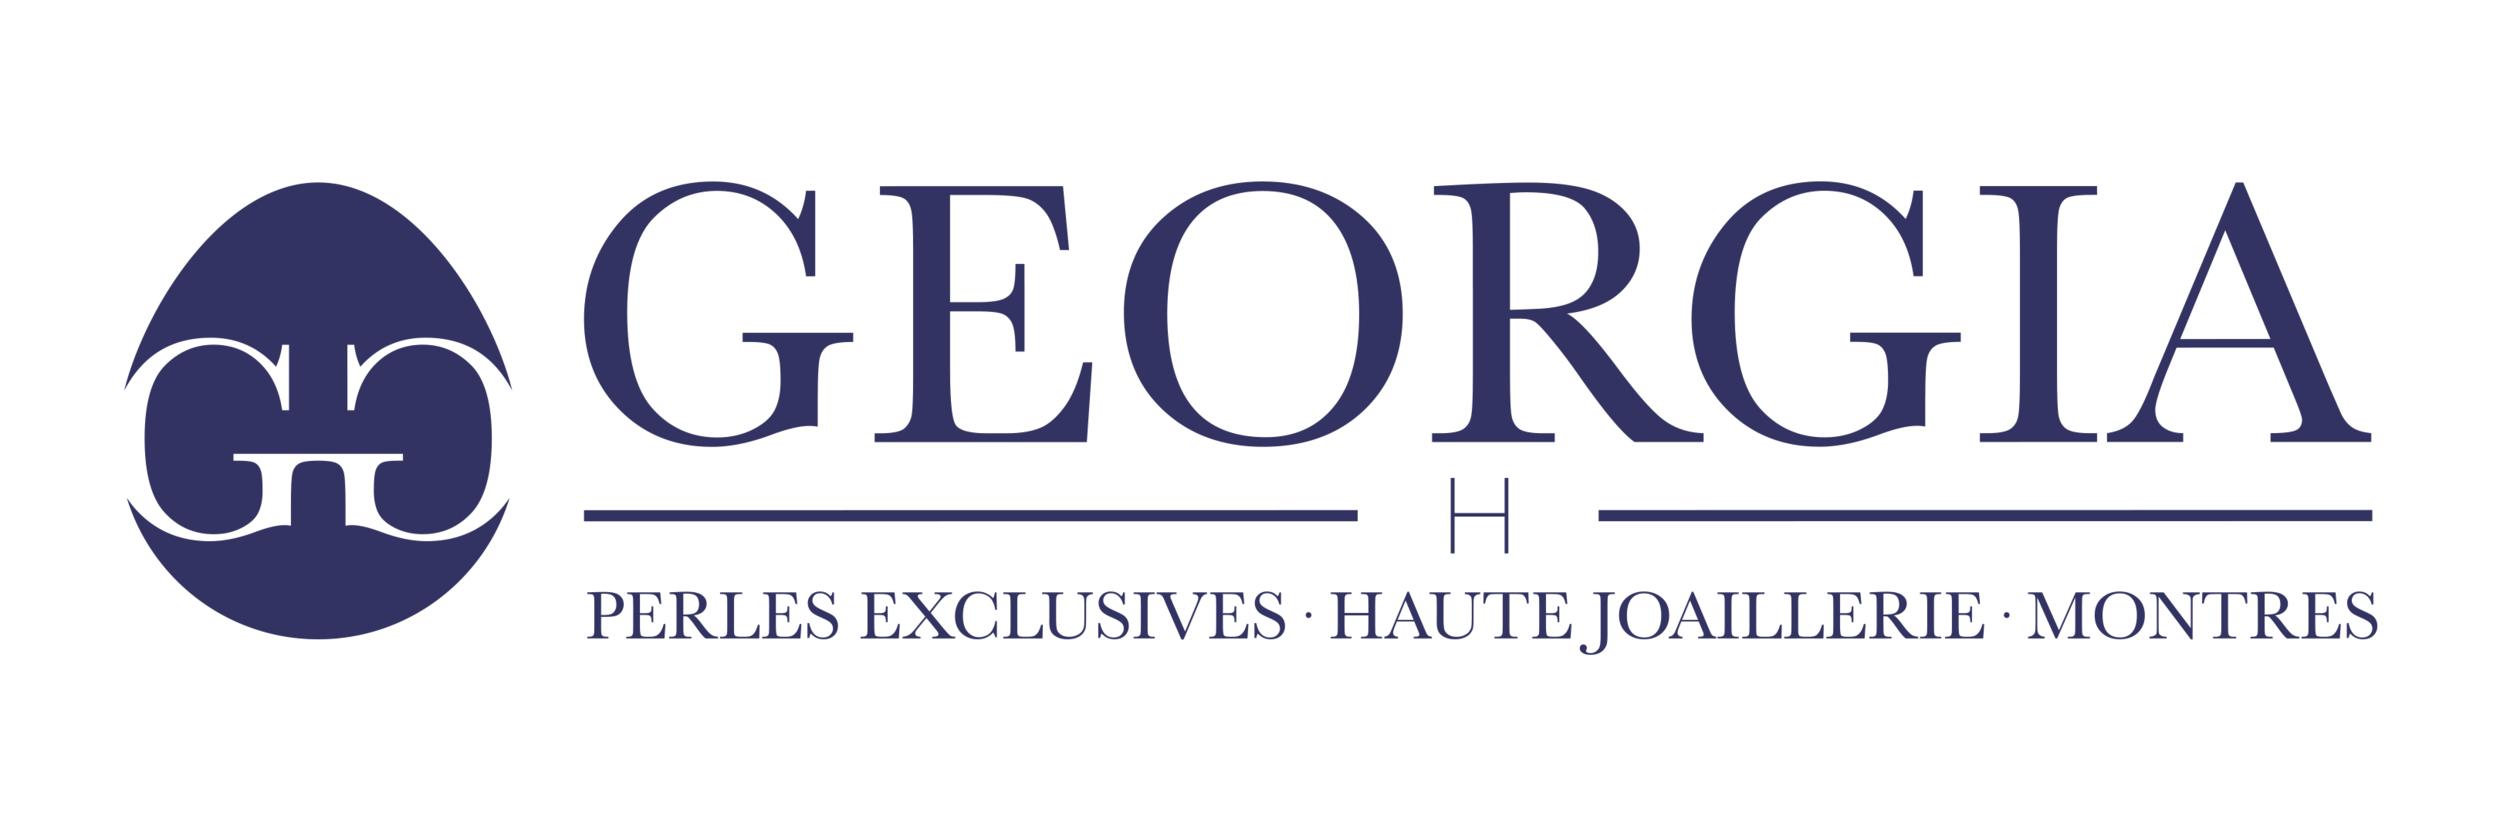 Georgia H. Andorra